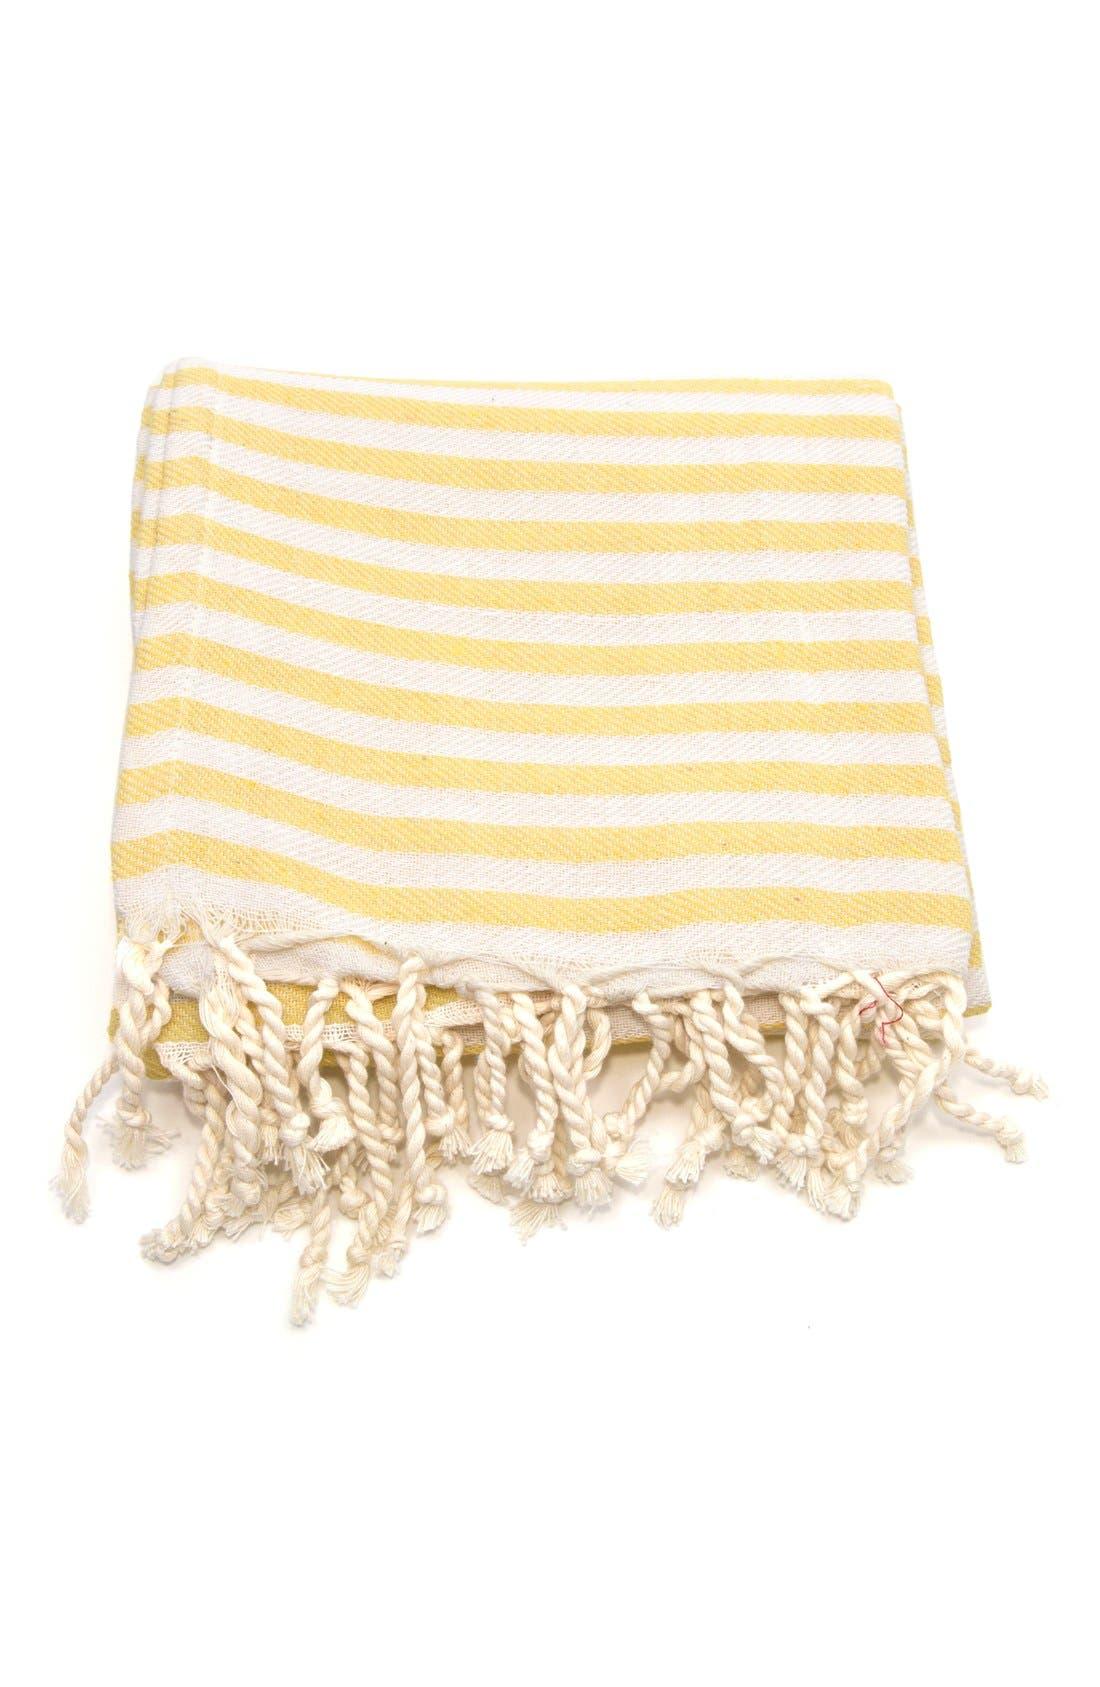 'Fun in the Sun' Turkish Pestemal Towel,                             Alternate thumbnail 3, color,                             Sunshine Yellow